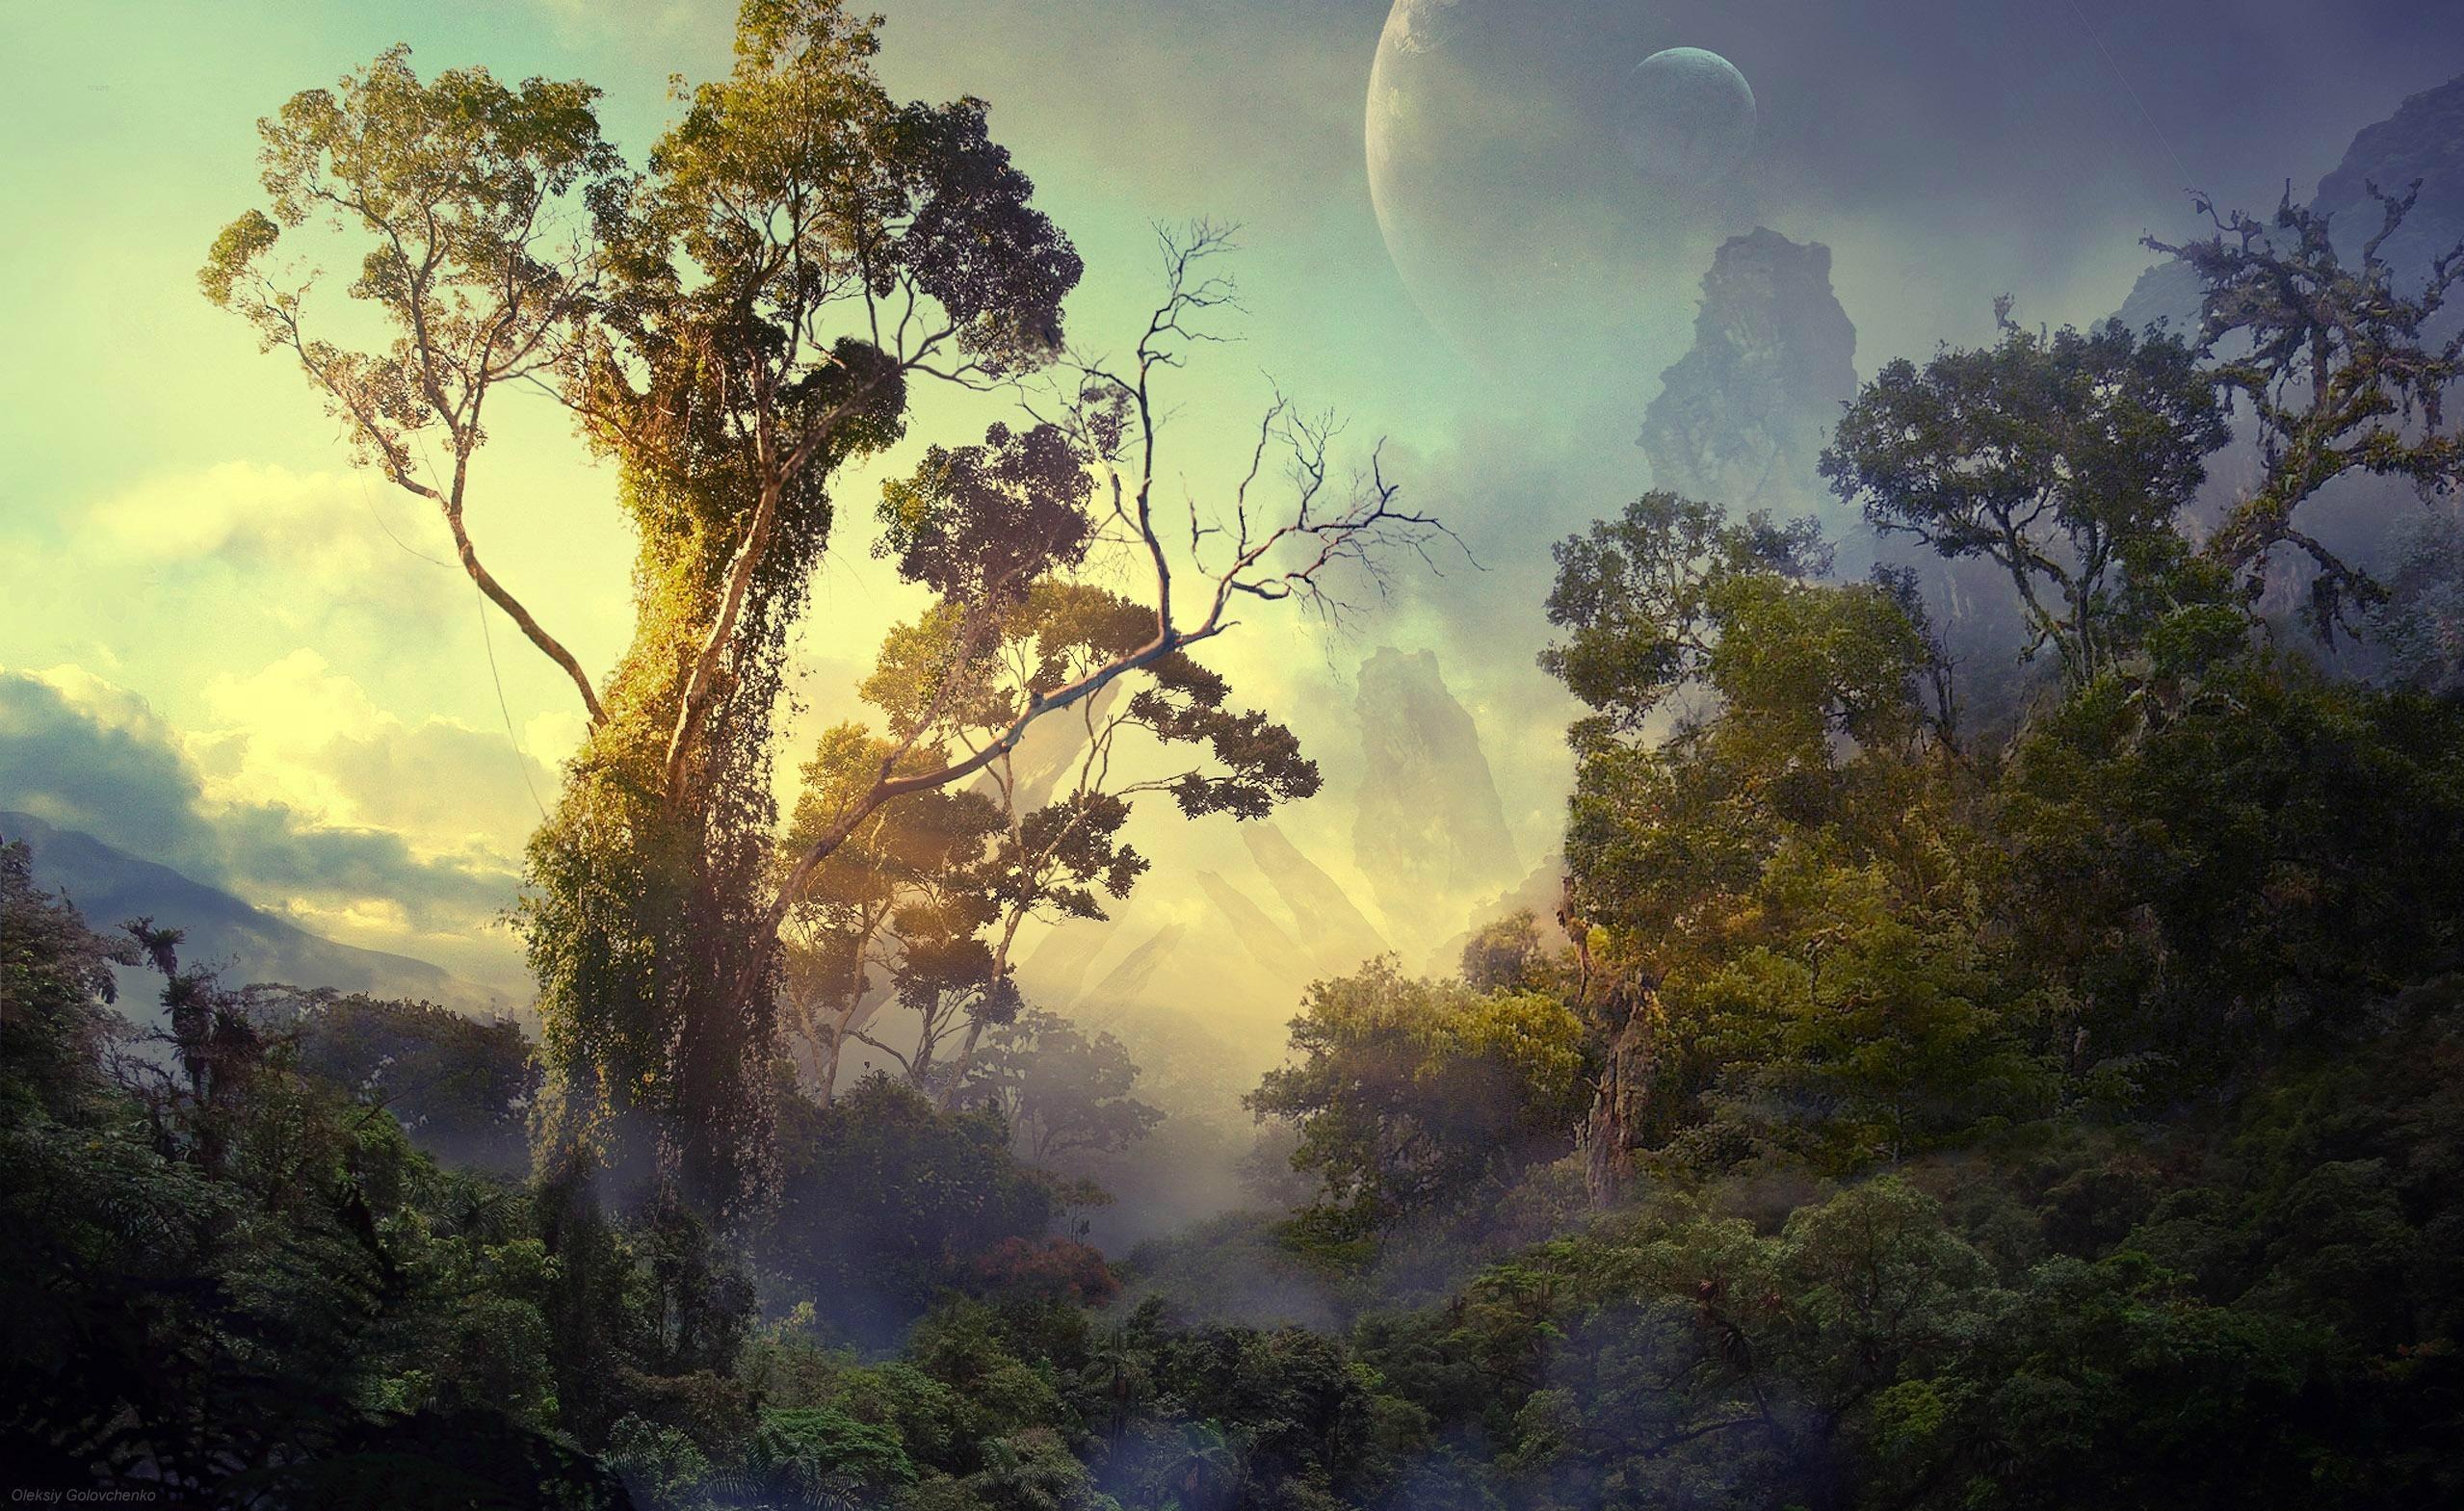 landscape wallpaper trees